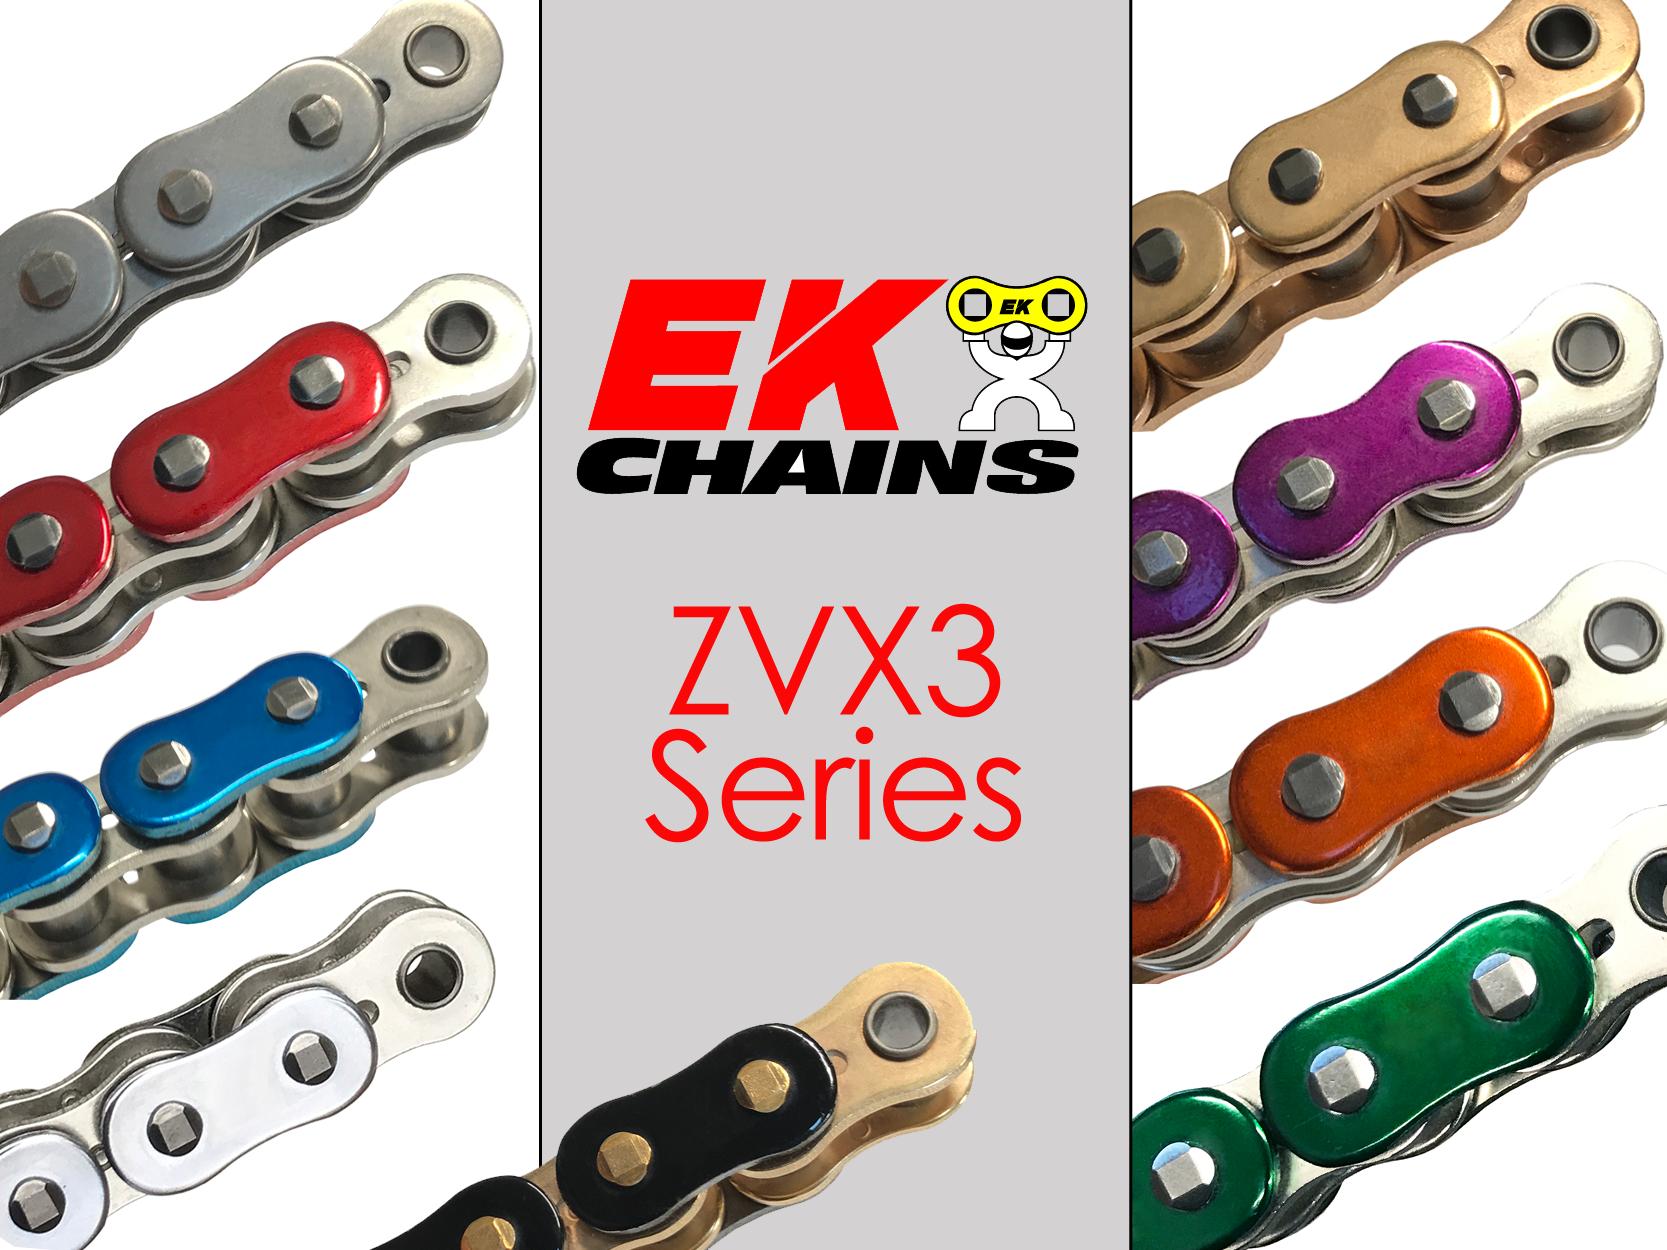 EK Chains 530 x 100 Links Standard Series Non Oring Natural Drive Chain